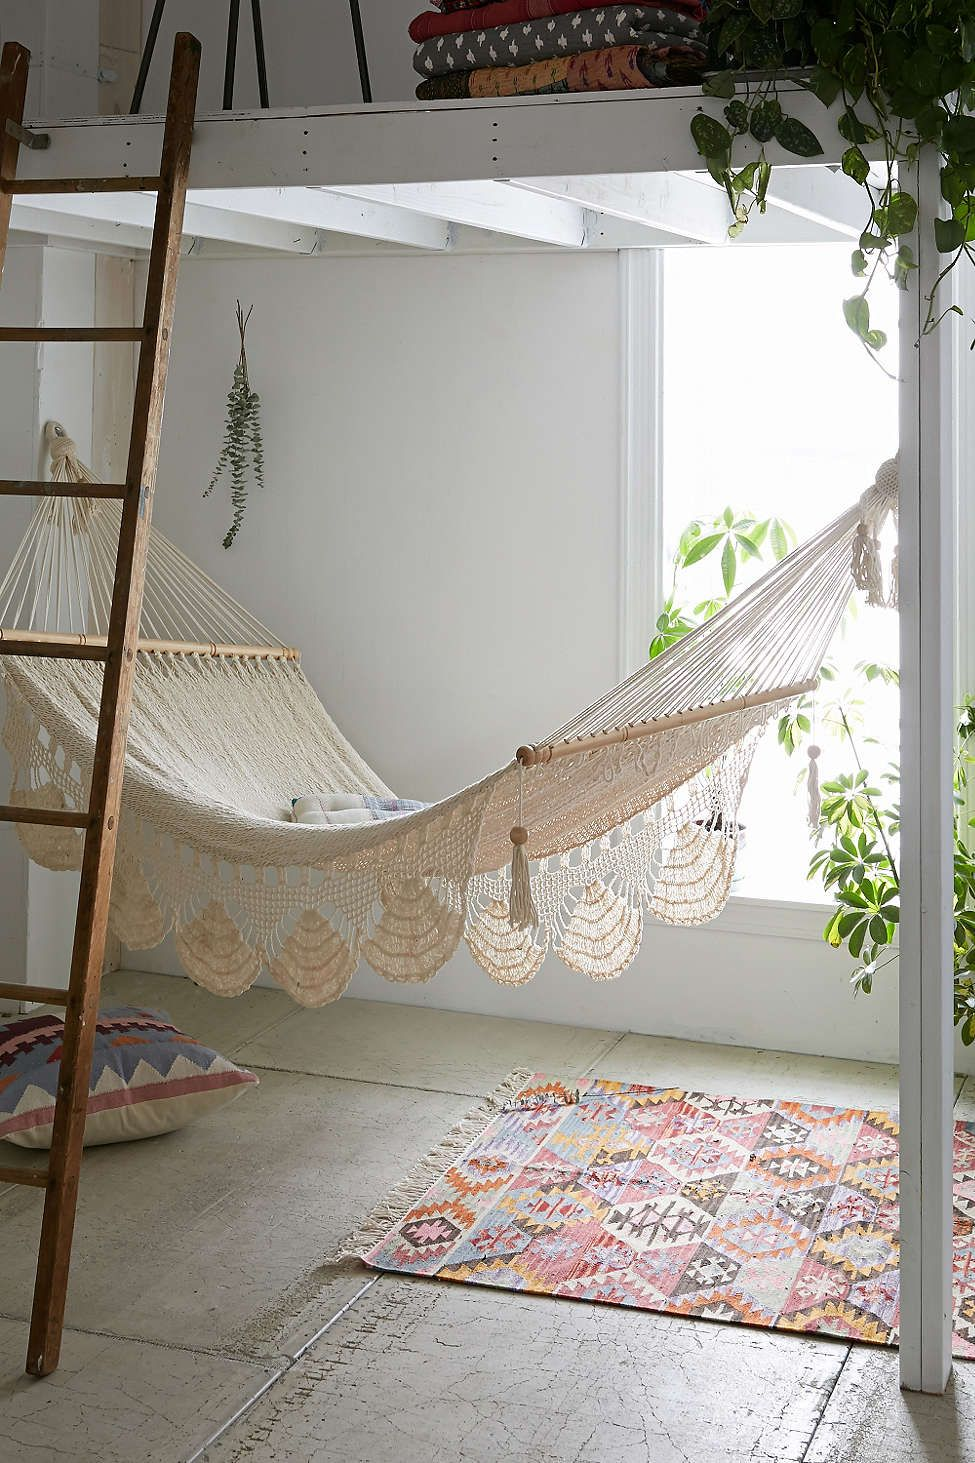 Macrame hammock my new house pinterest urban outfitters urban